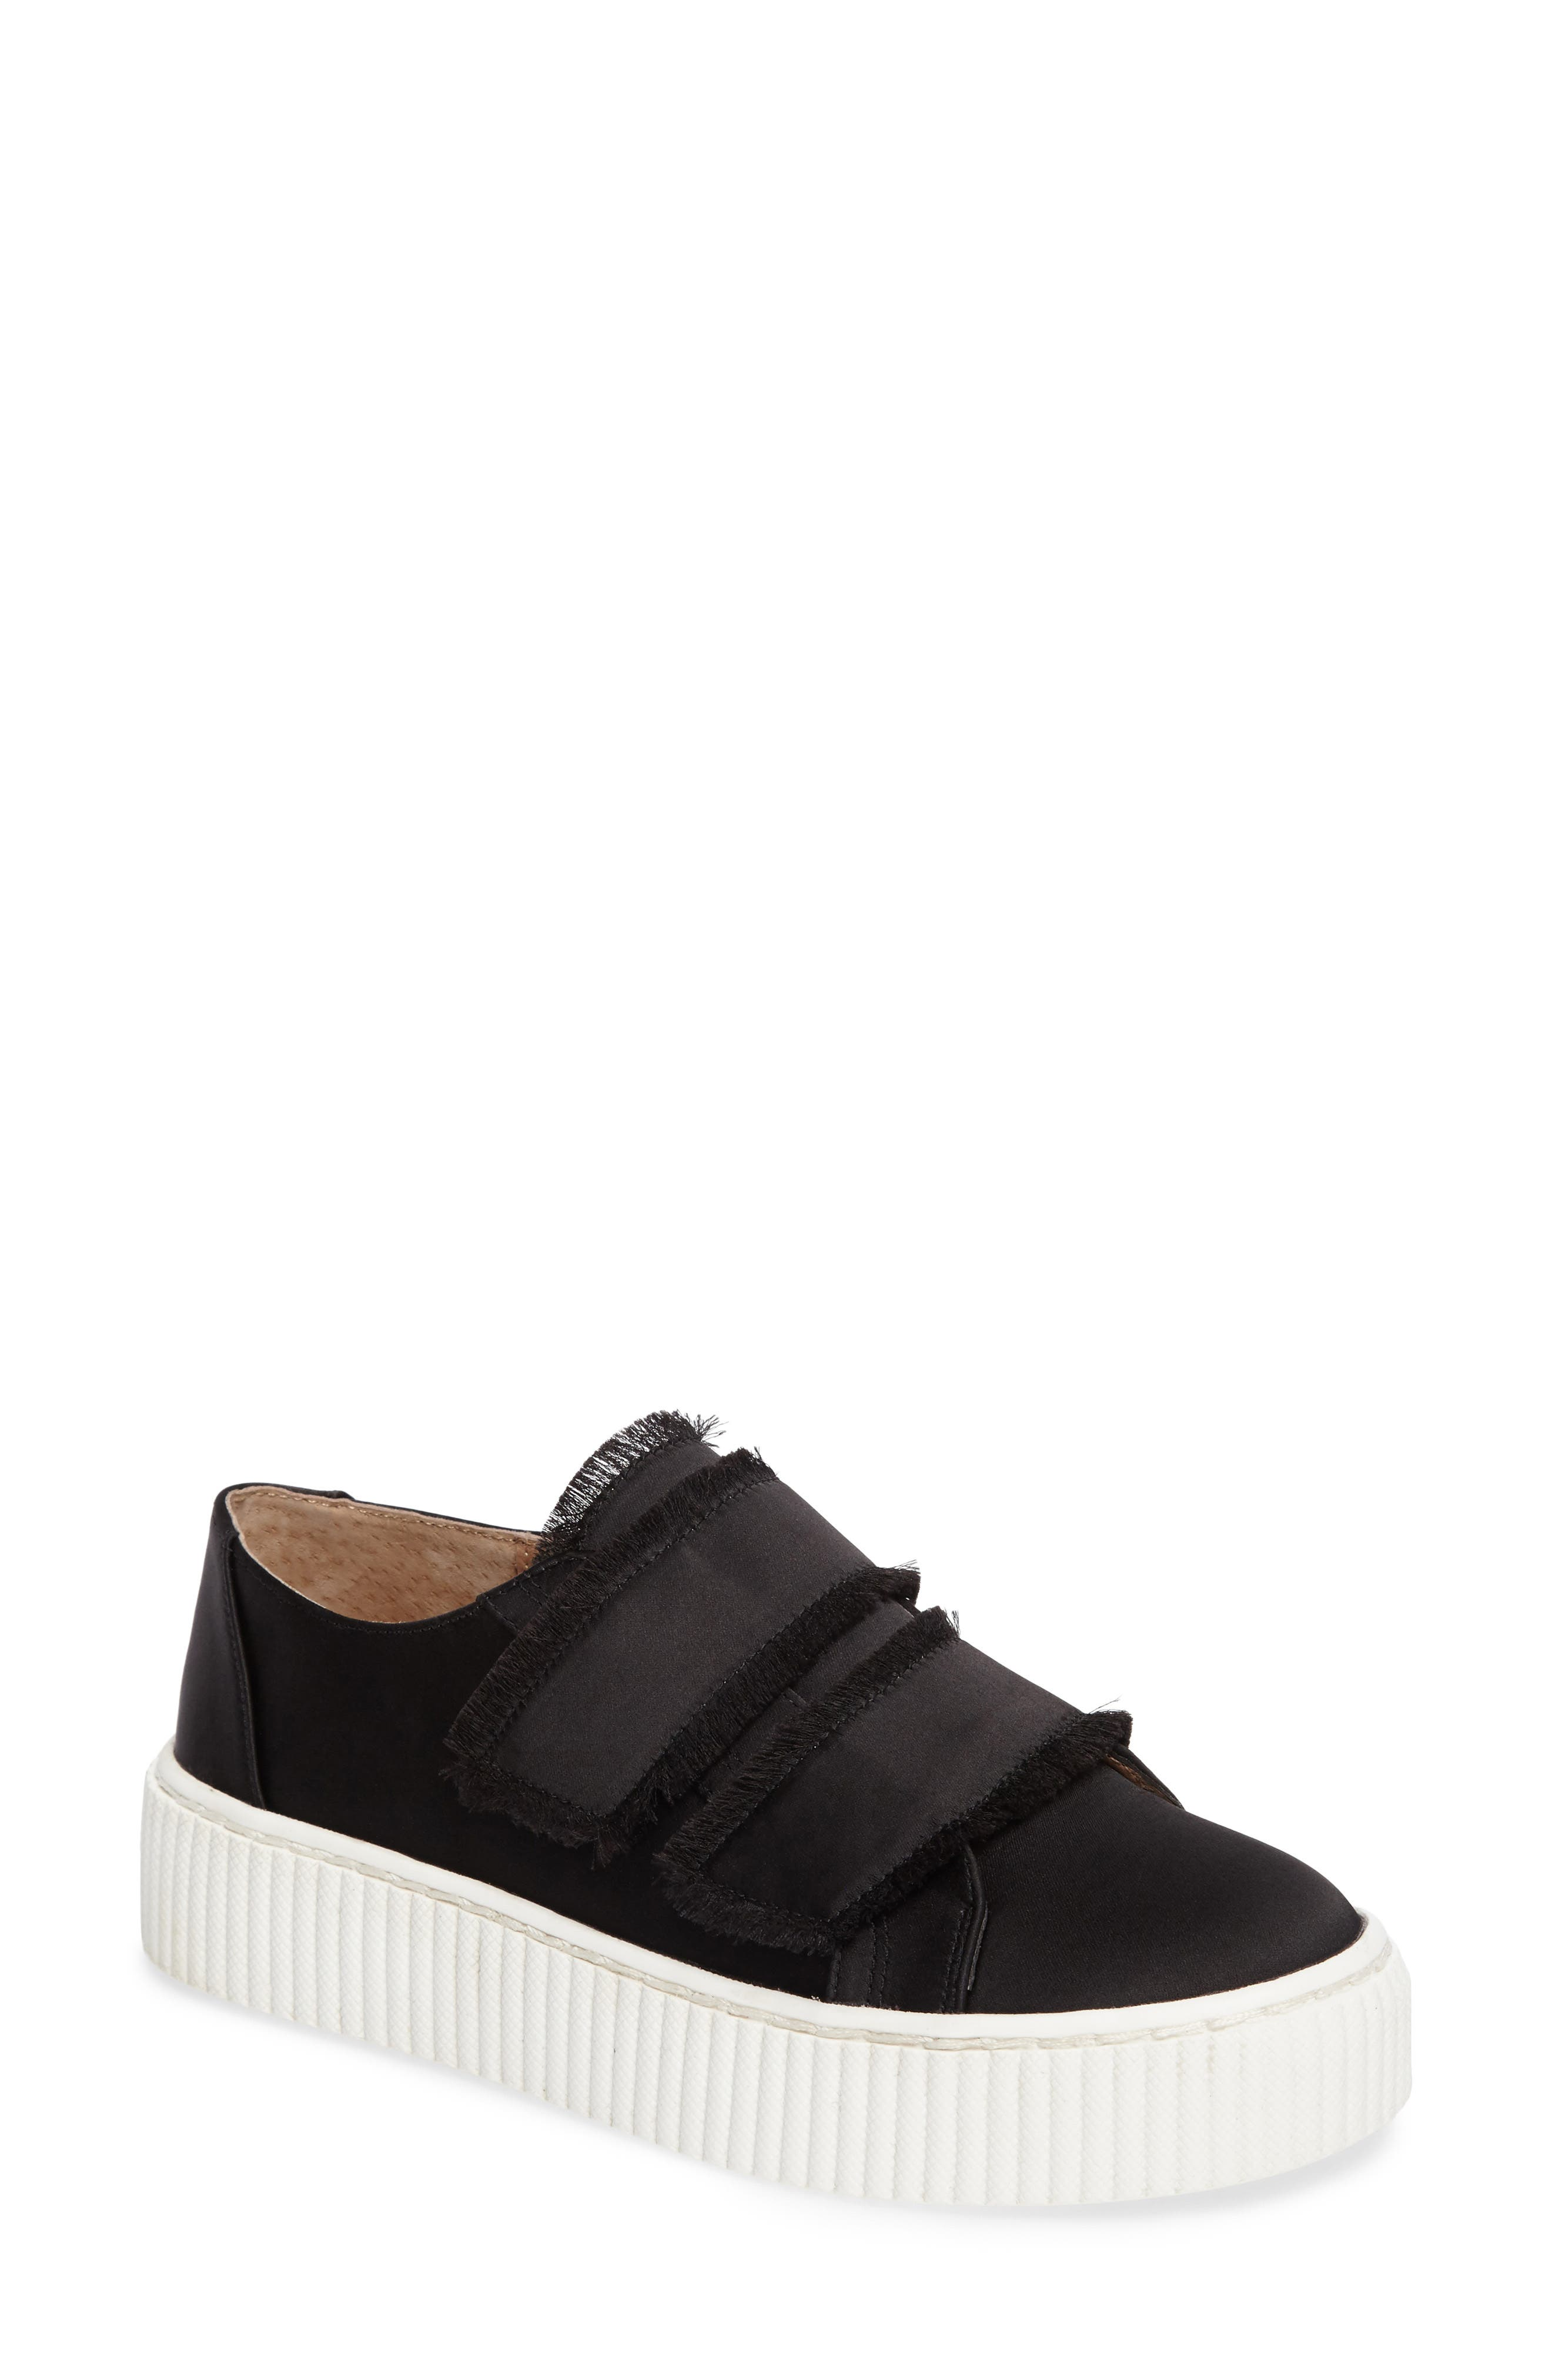 Shellys London Elder Fringed Platform Sneaker (Women)